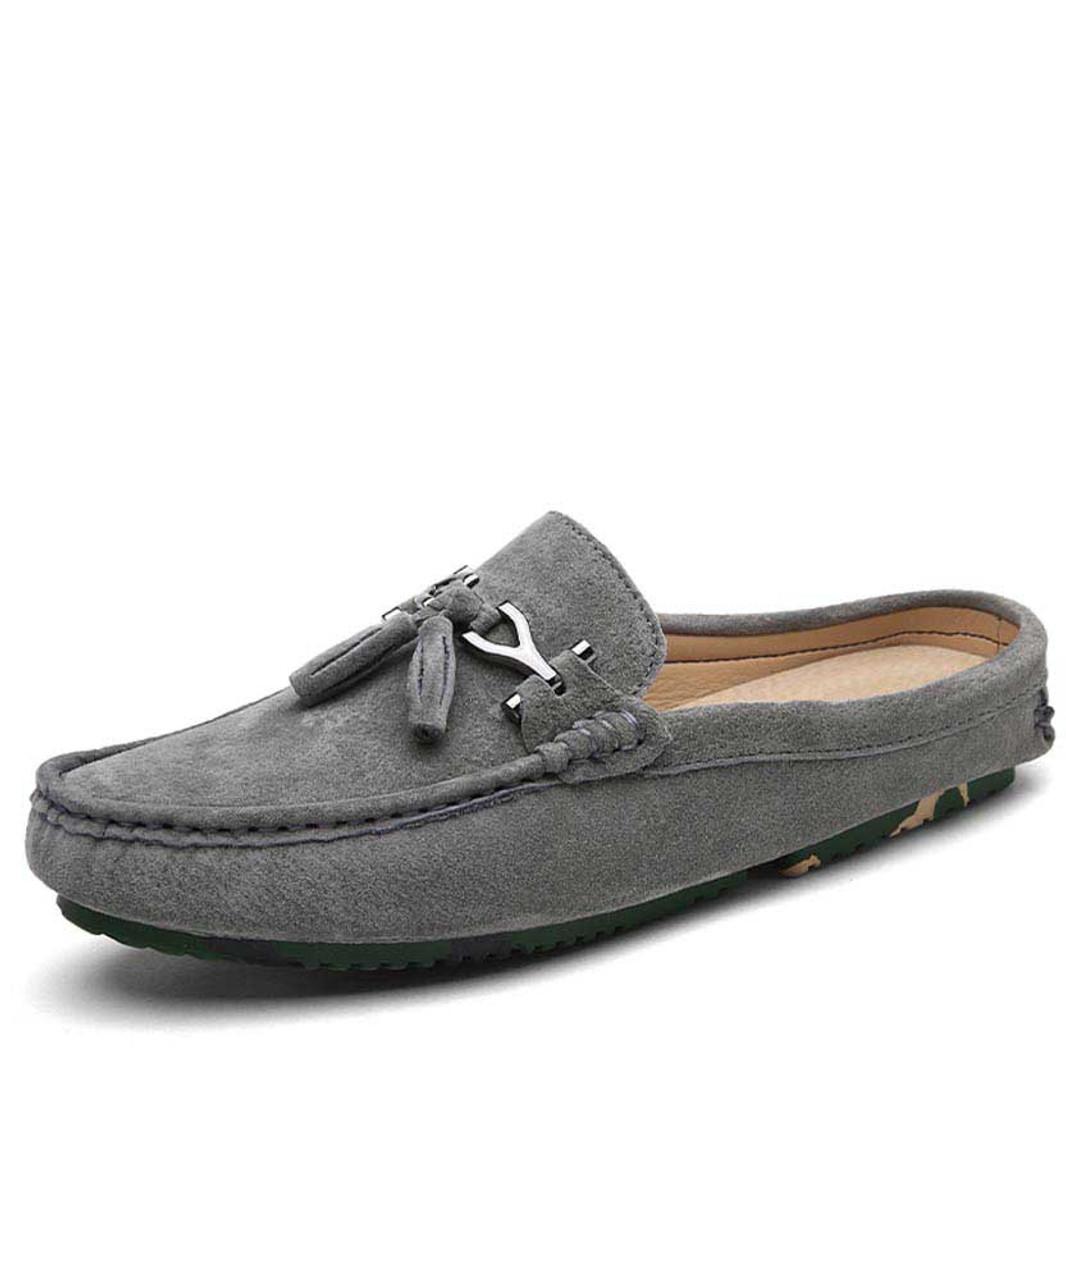 Grey tassel buckle leather slip on half